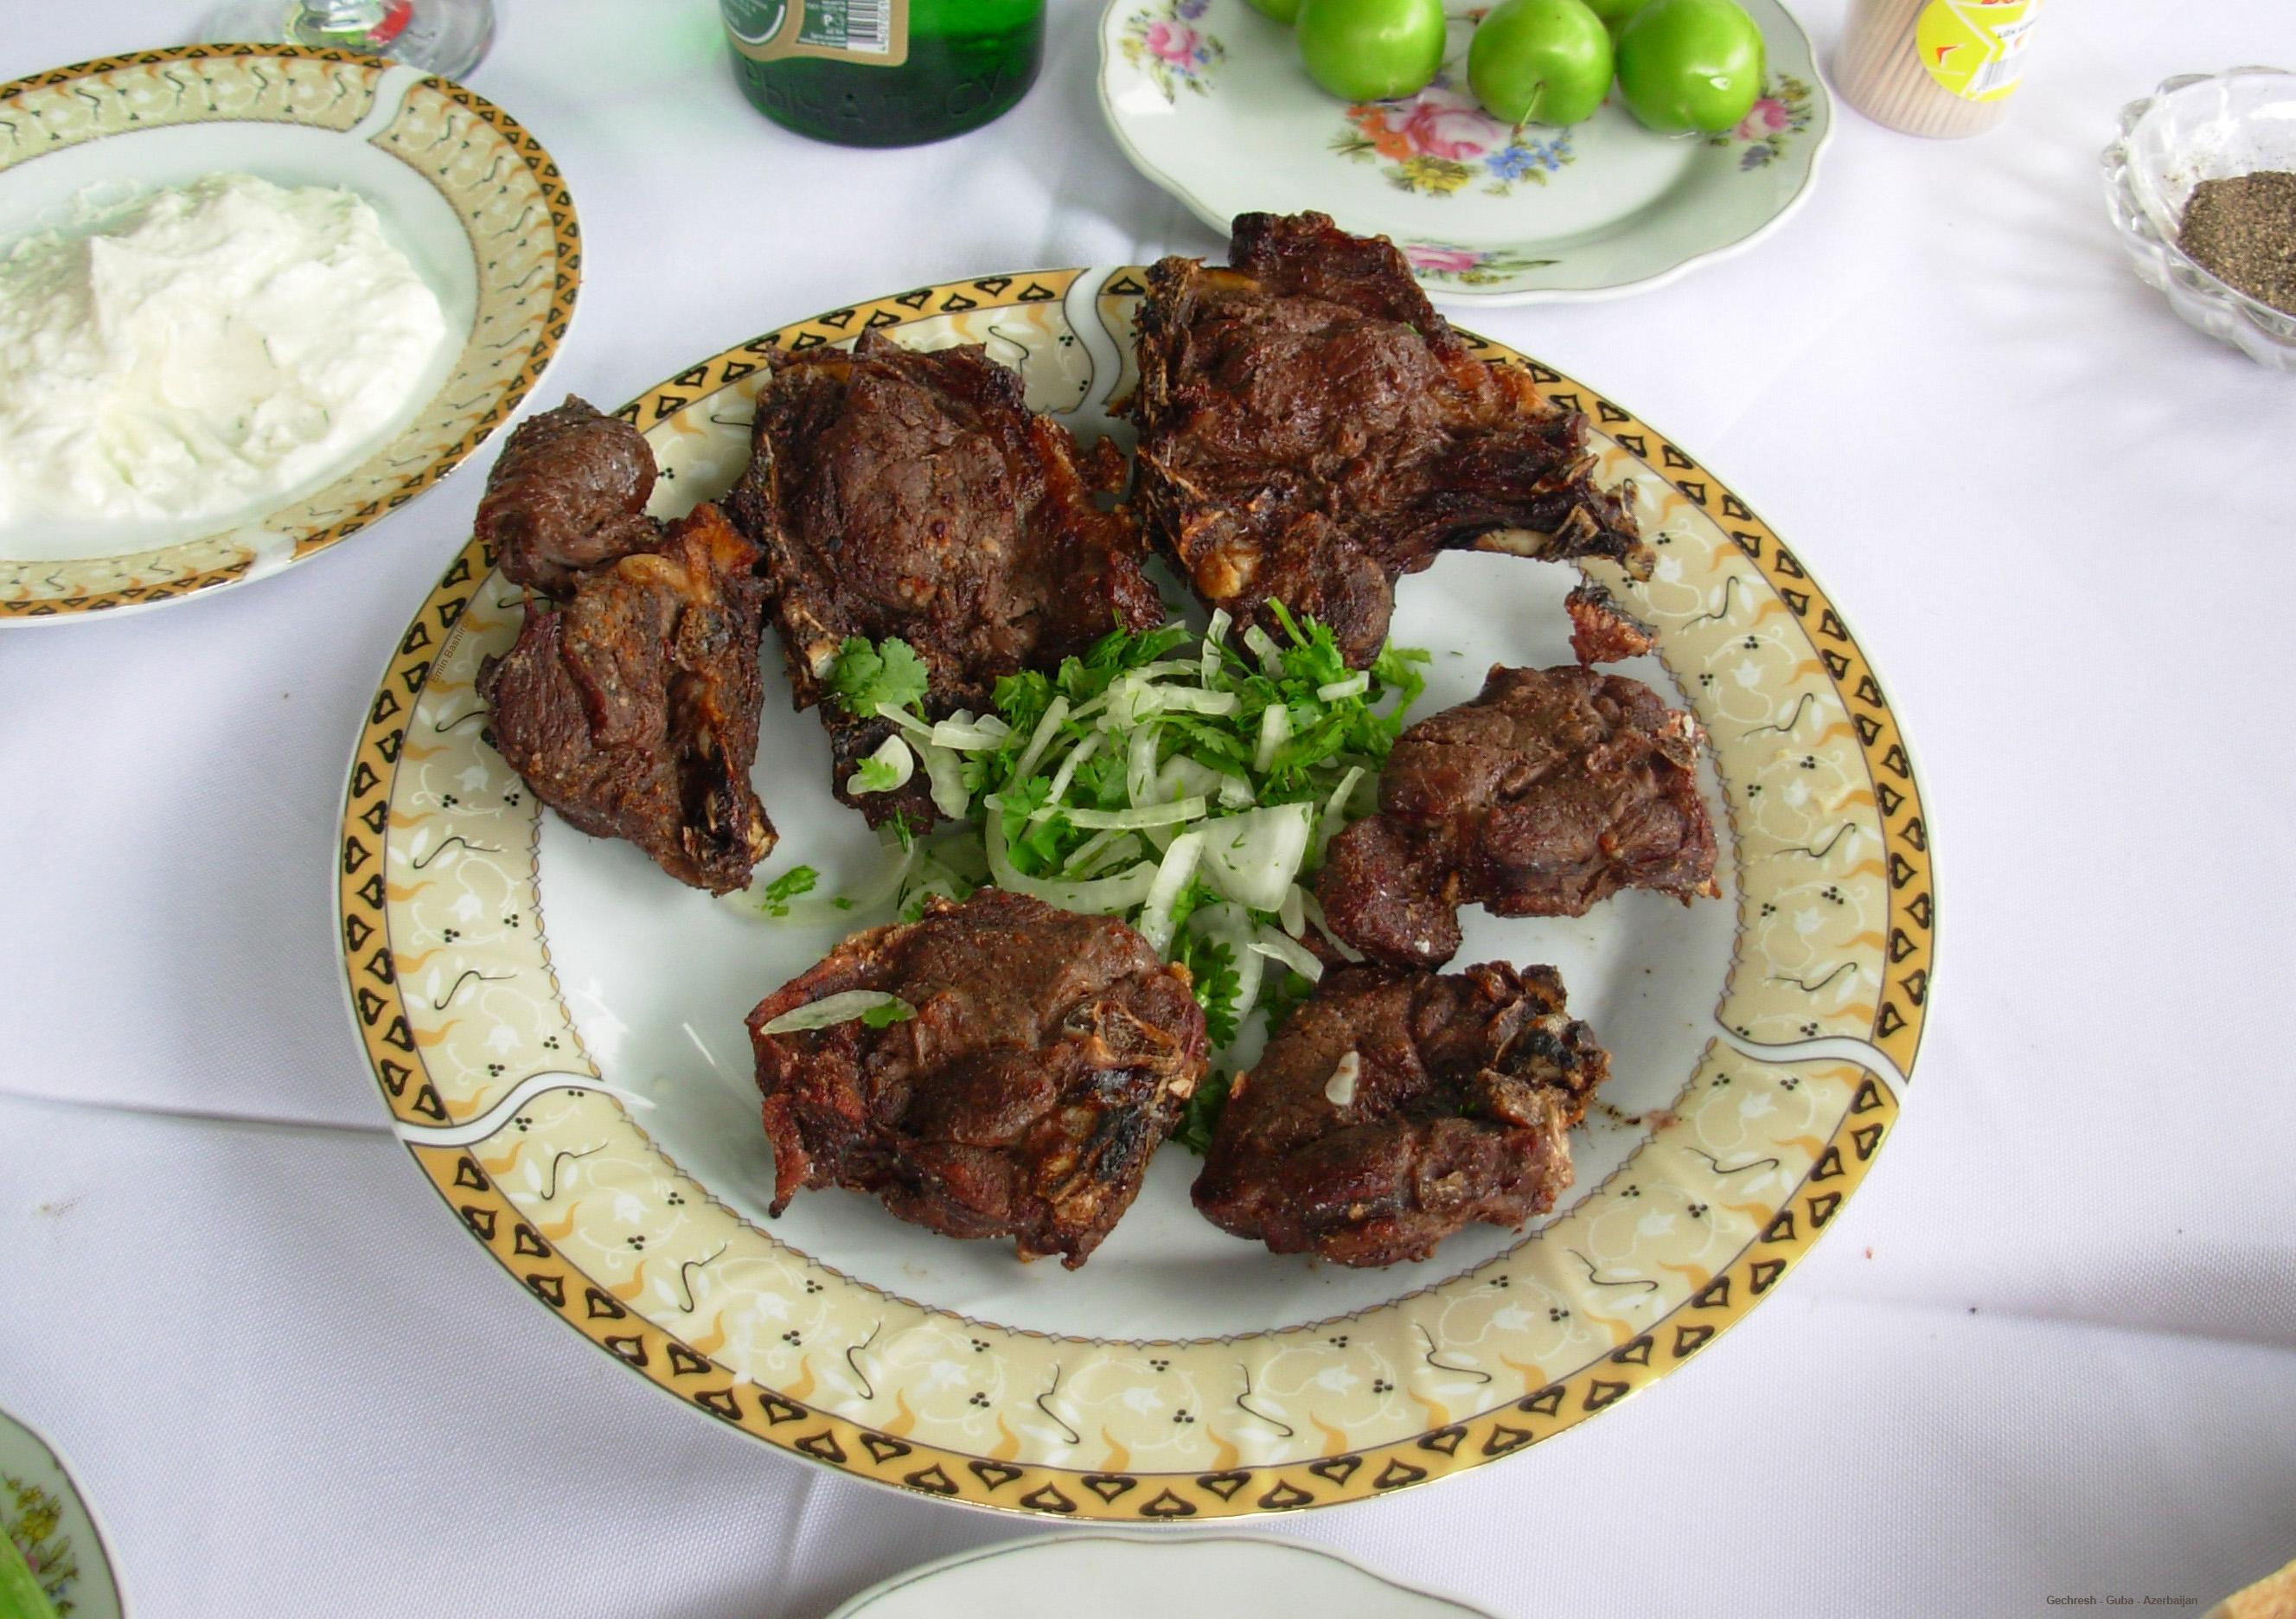 w ne food gechresh azerbaijan w k pediya